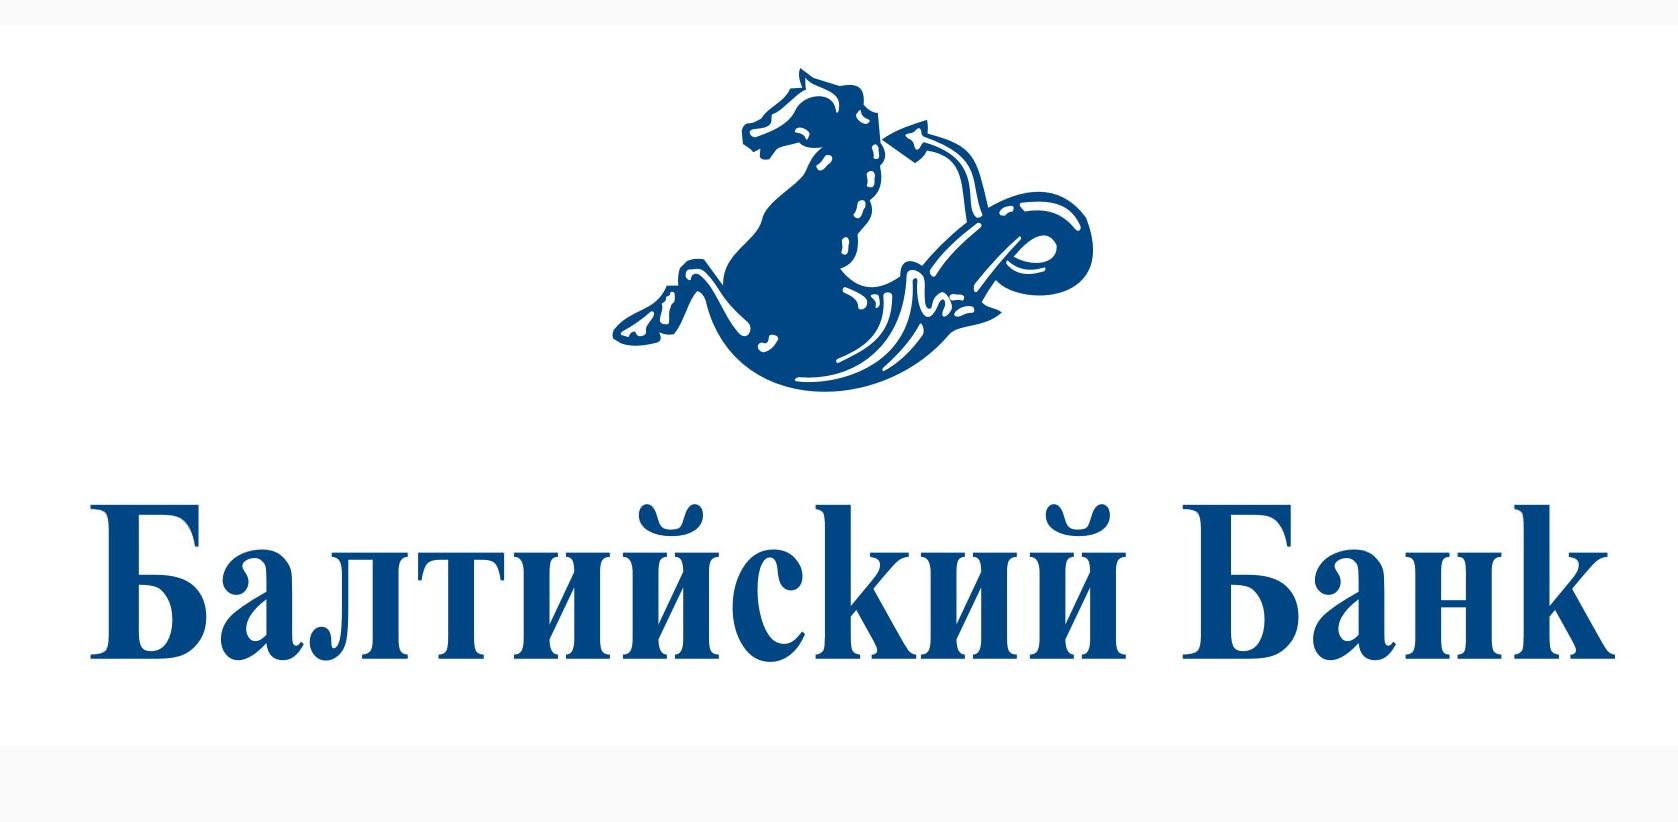 Балтийский банк вклады в новгород